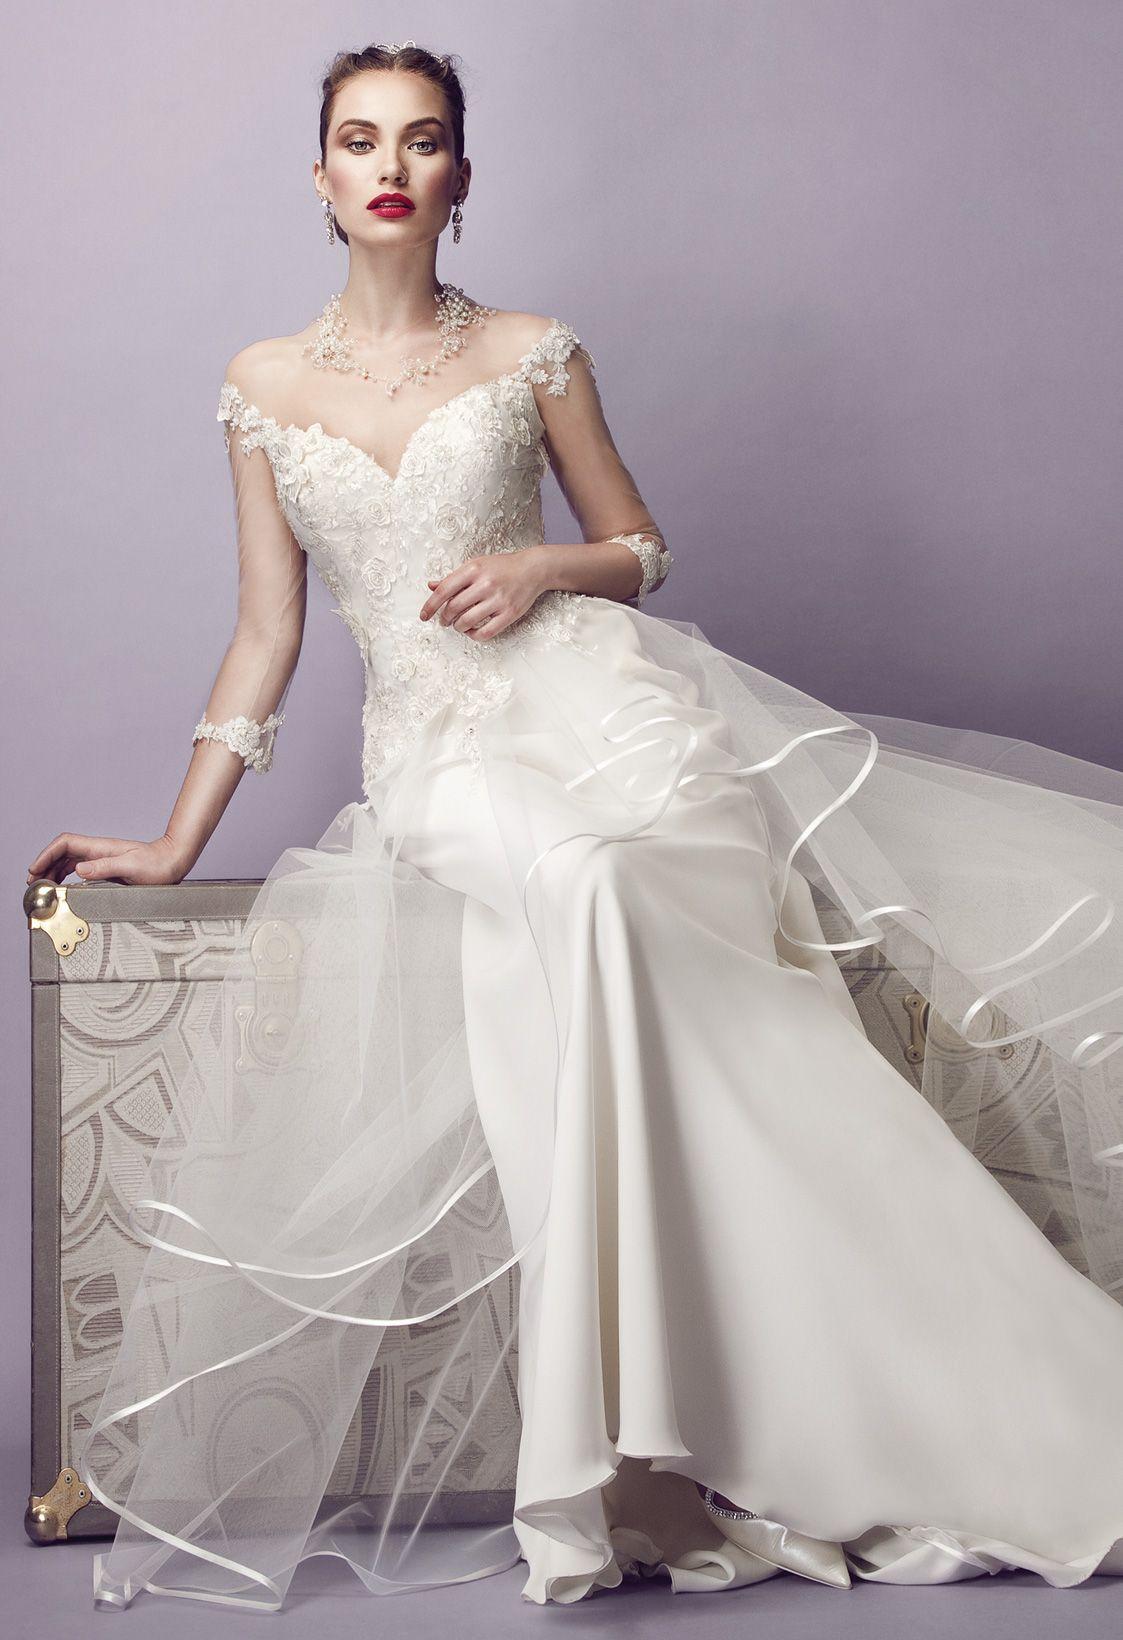 Abiti Da Sposa Elvira Gramano.Elvira Gramano Wedding Dresses Sleeveless Wedding Dress Dresses